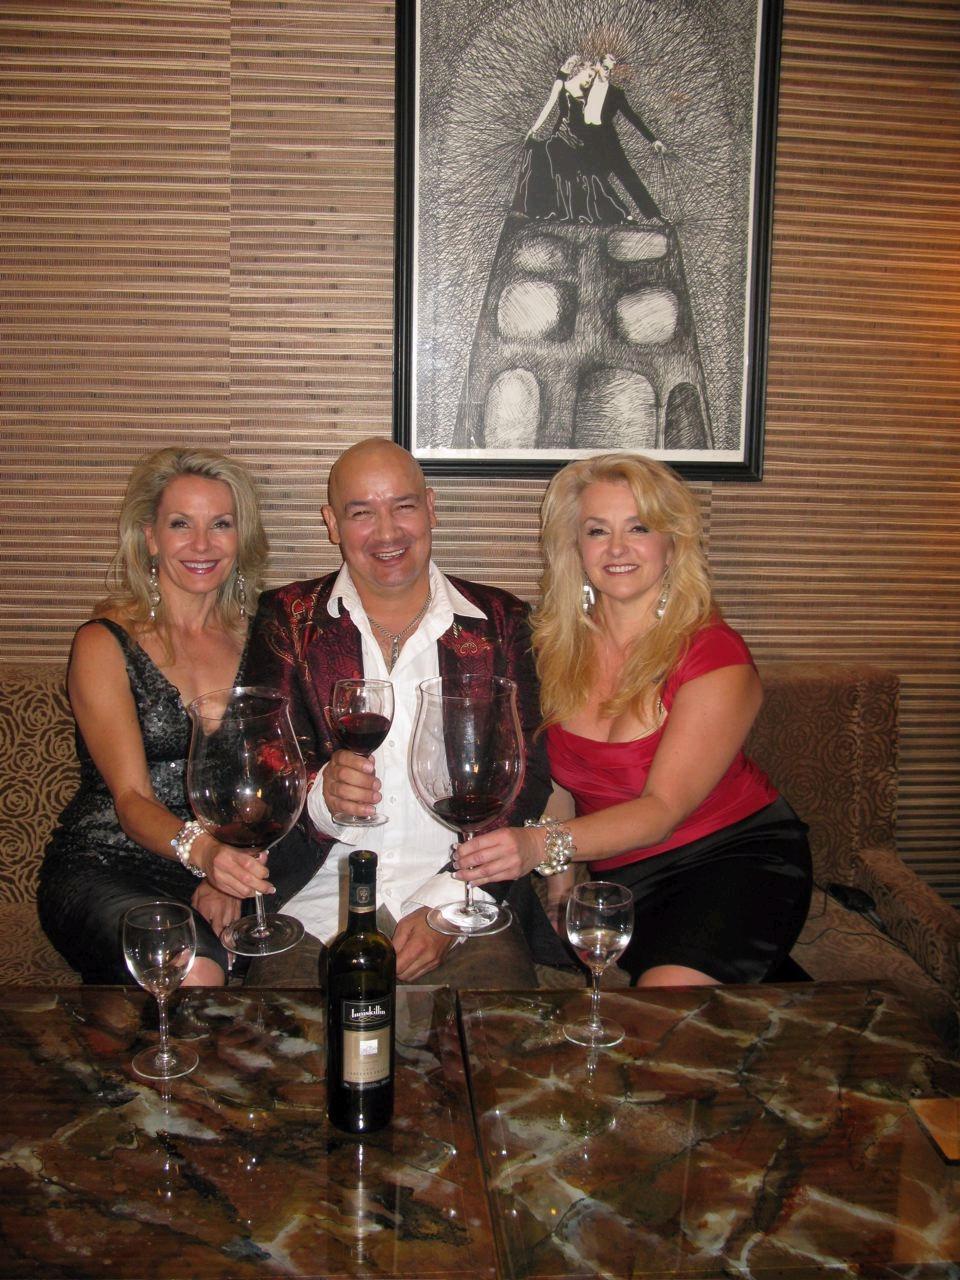 Tracy Griffith,Marilyn Joi Sex pics Smith Cho,Carole Ita White